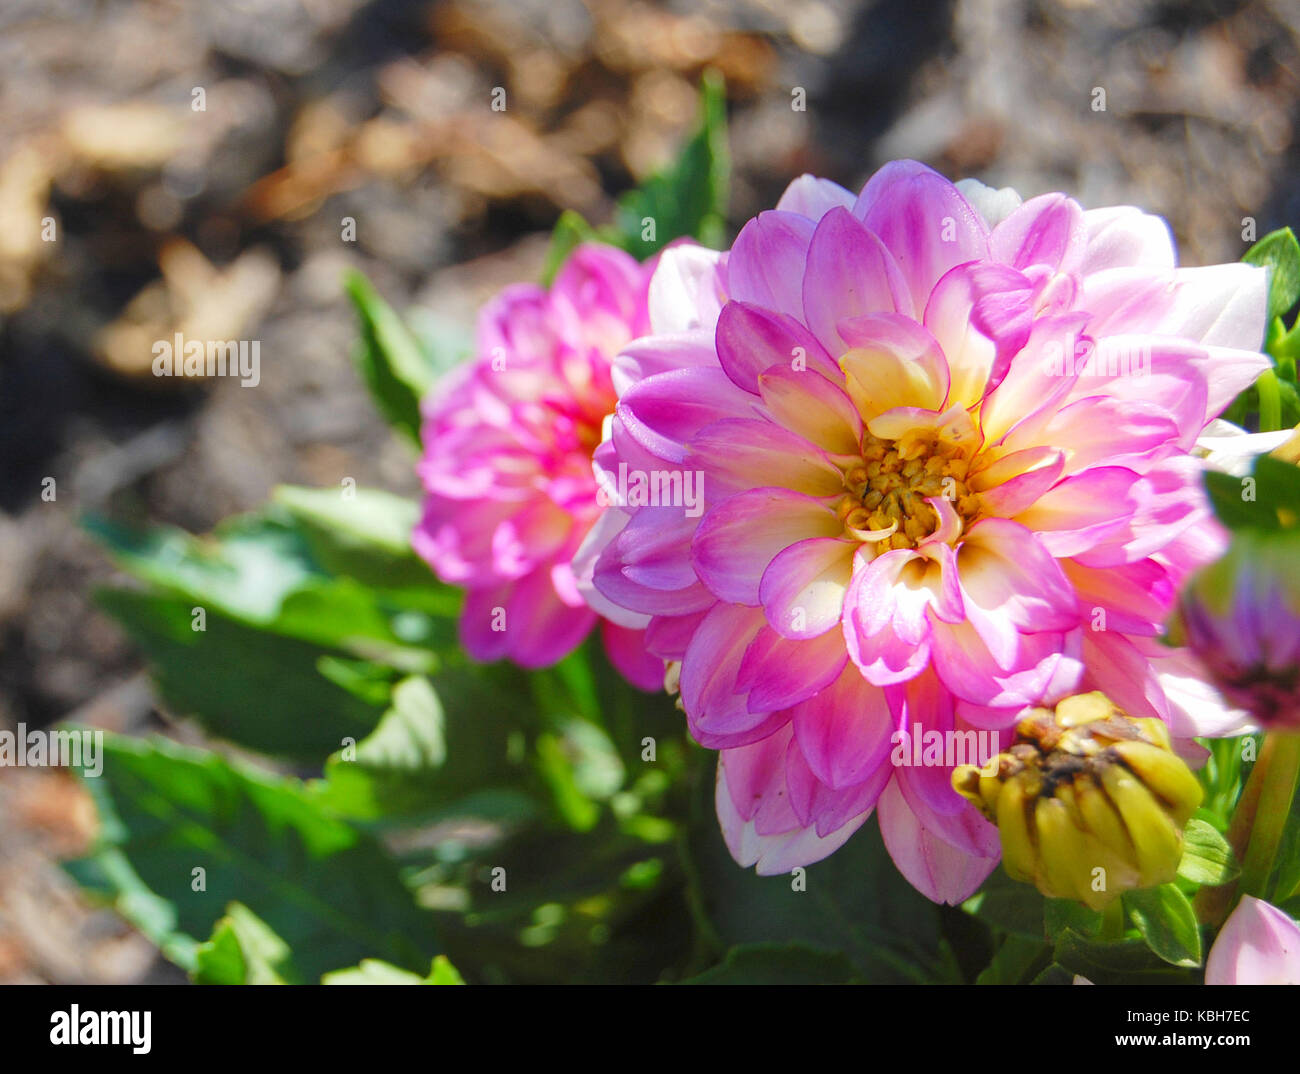 Magenta dahlias on a summer day - Stock Image